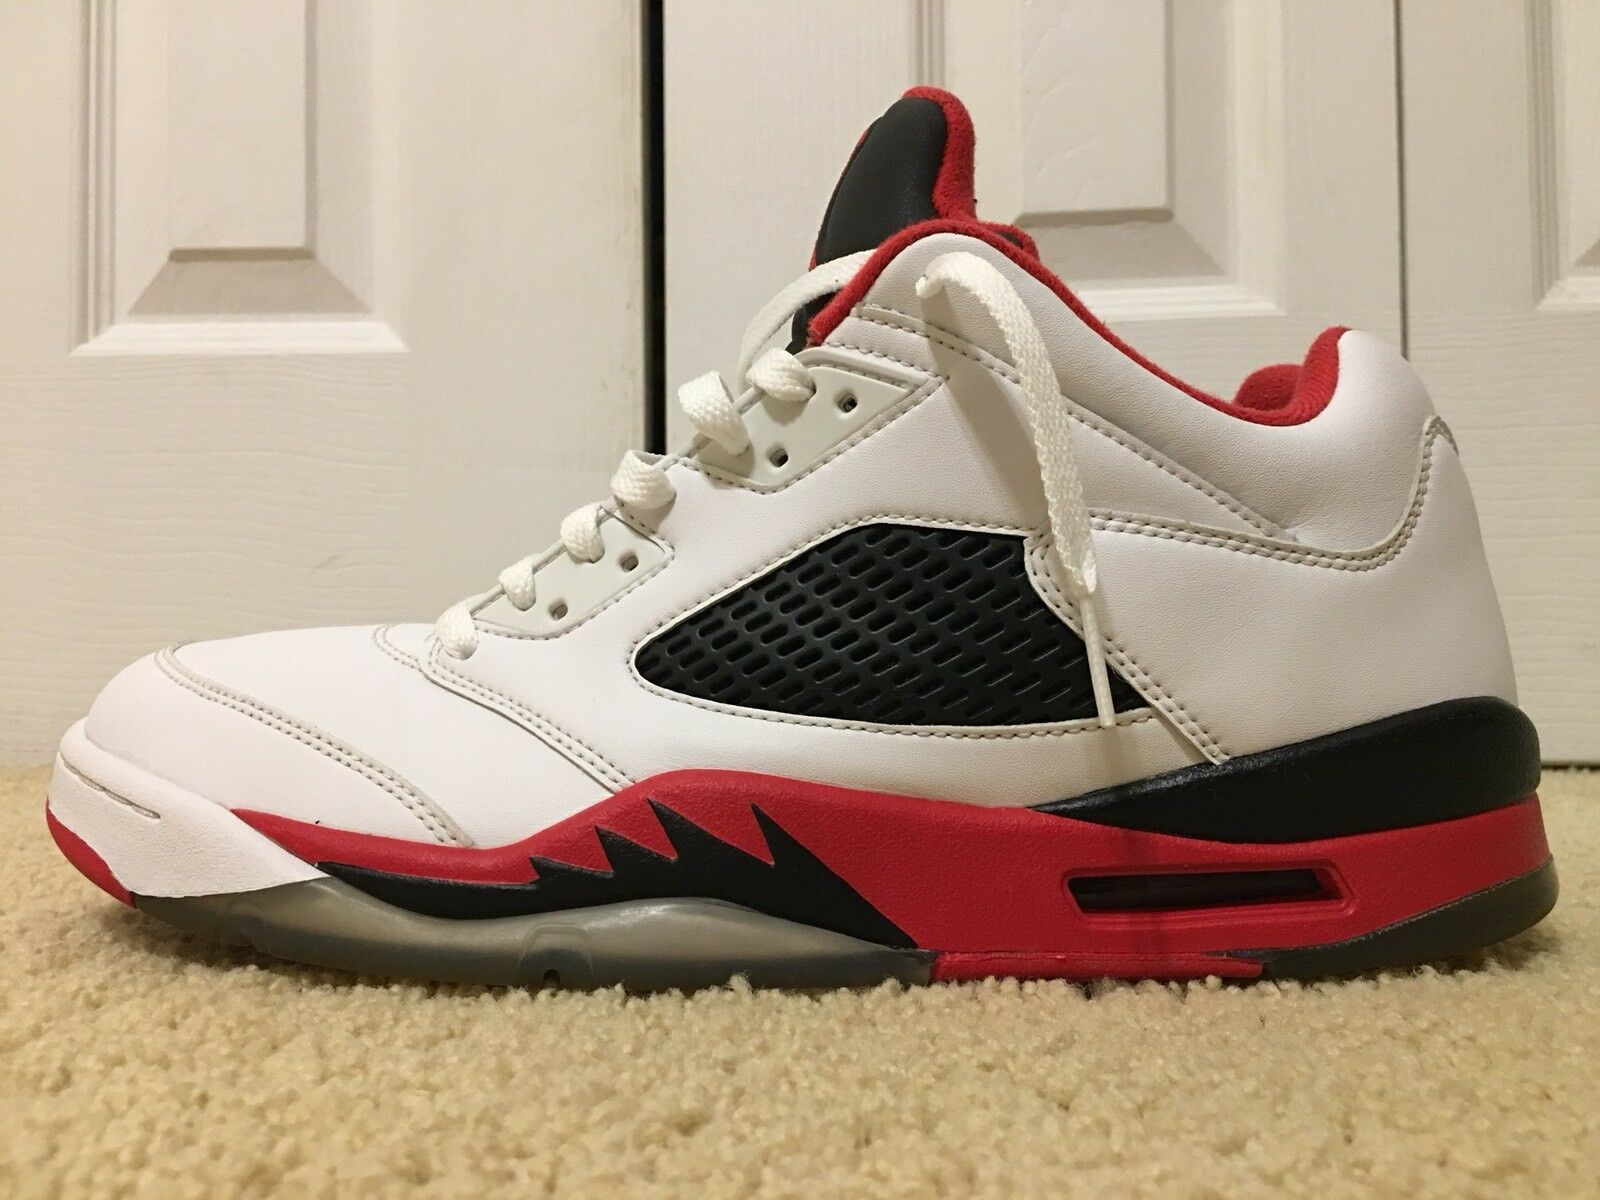 Nike air jordan v 5 retro - niedrig, 819171-101, weiße / feuer rot / schwarz, männer - größe.